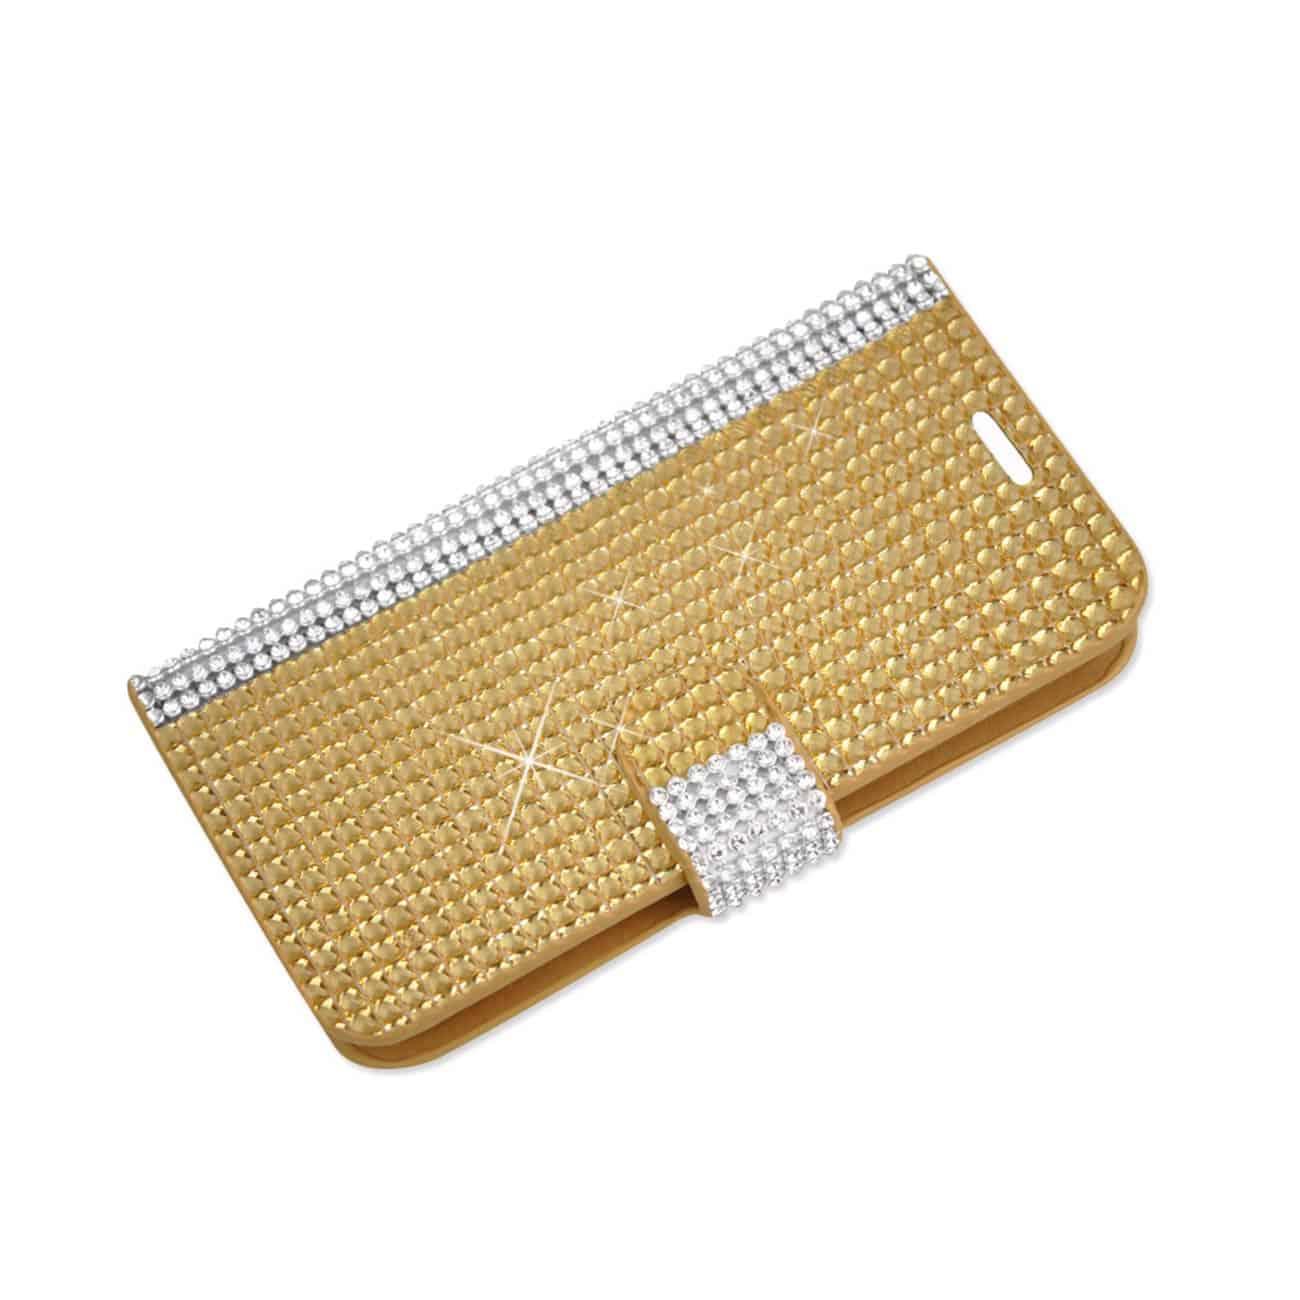 ZTE SONATA 2 JEWELRY DIAMOND RHINESTONE WALLET CASE IN GOLD